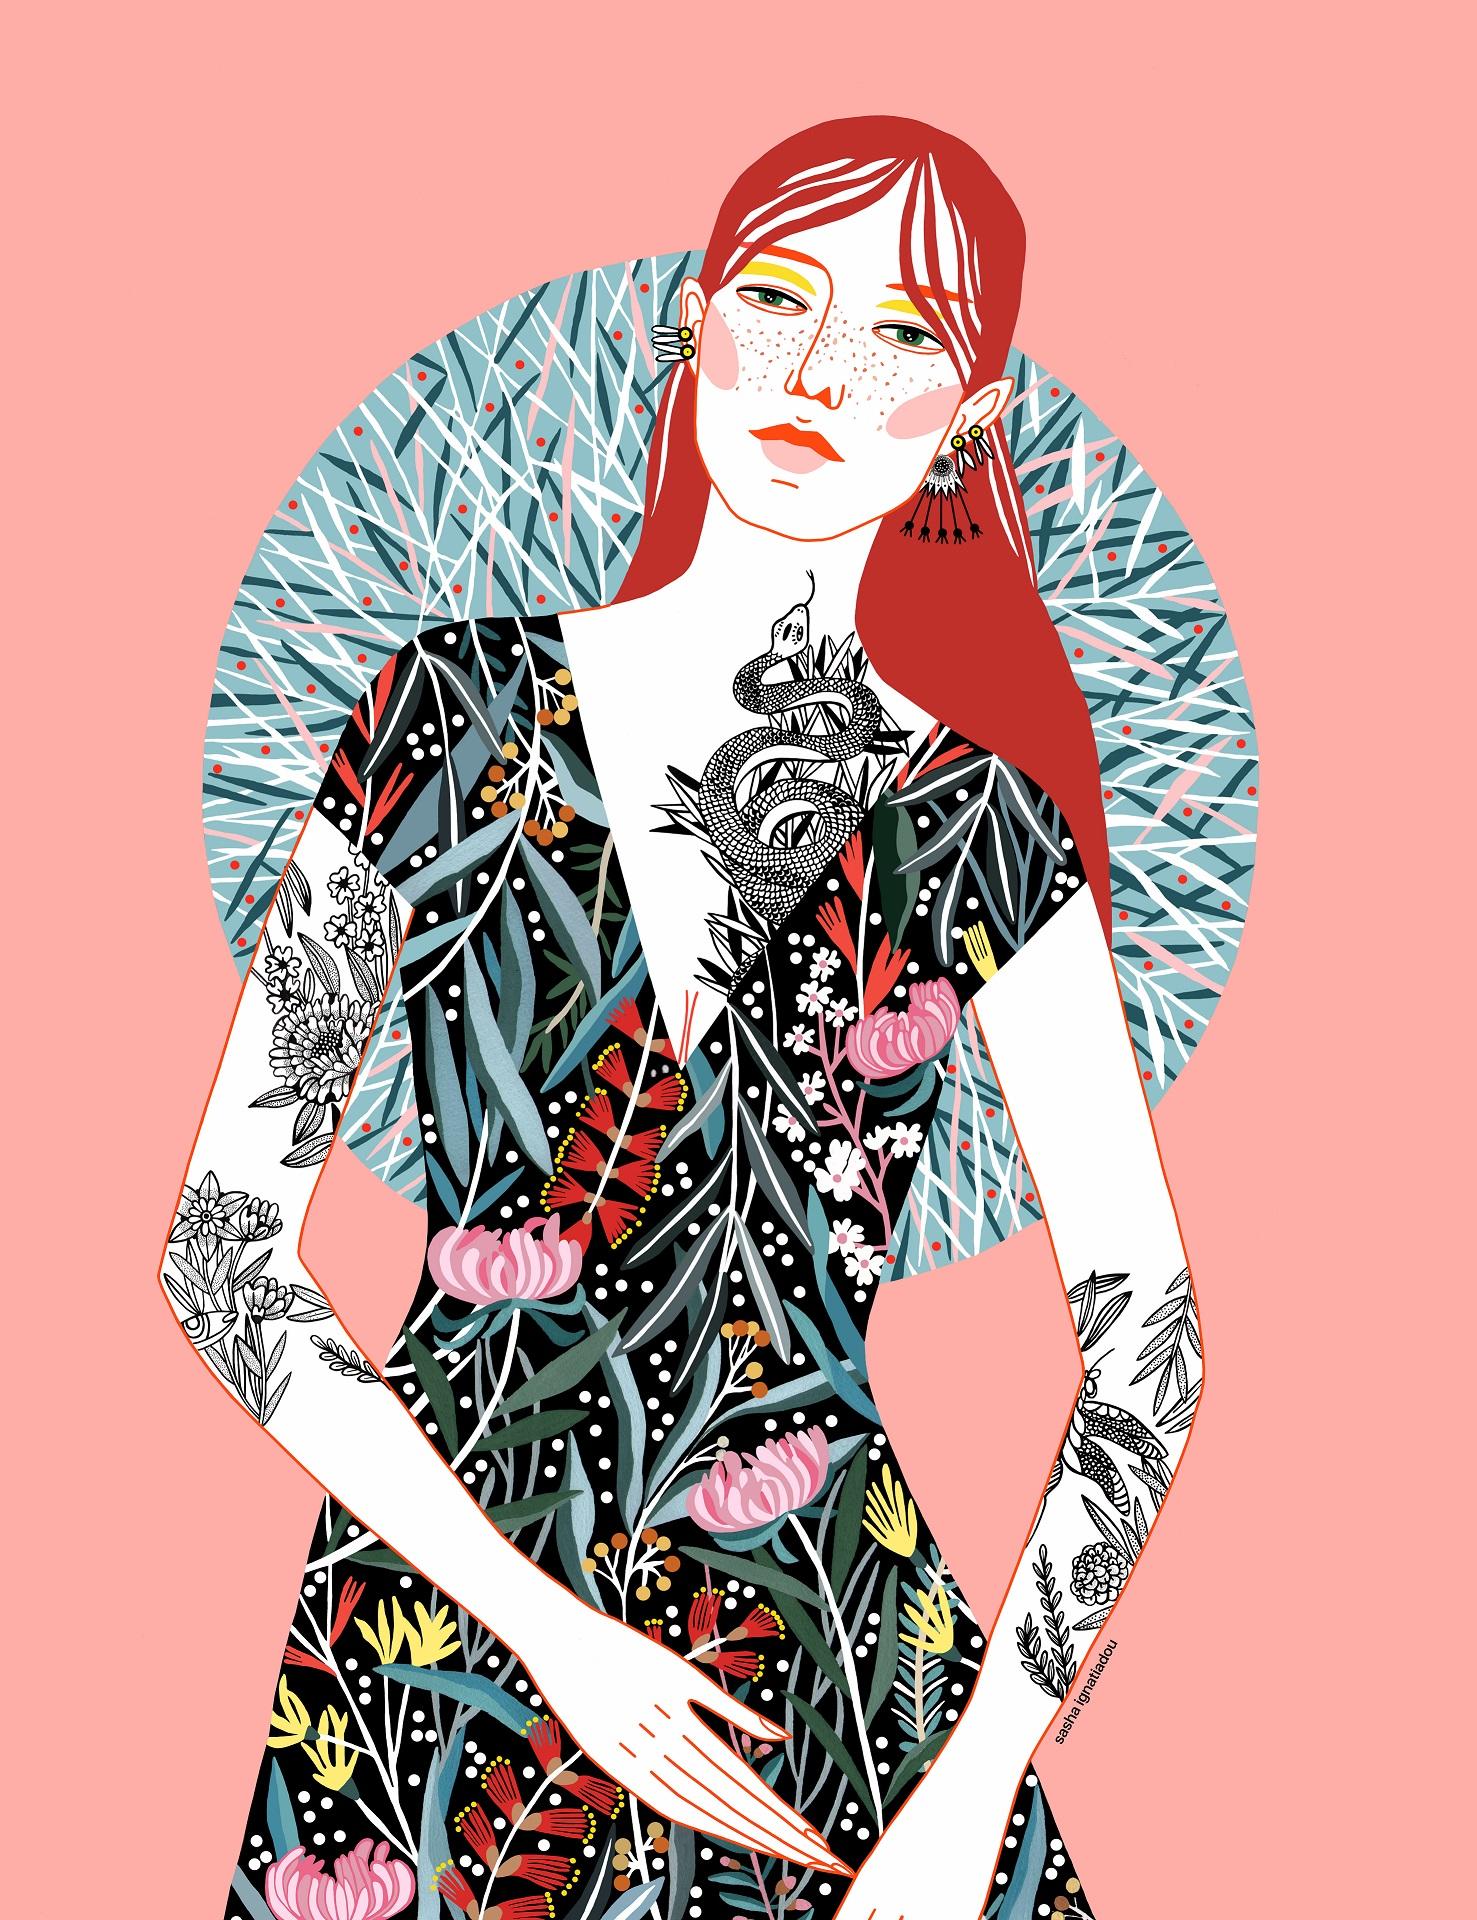 Sasha Ignatiadou @ iloveillustration.net